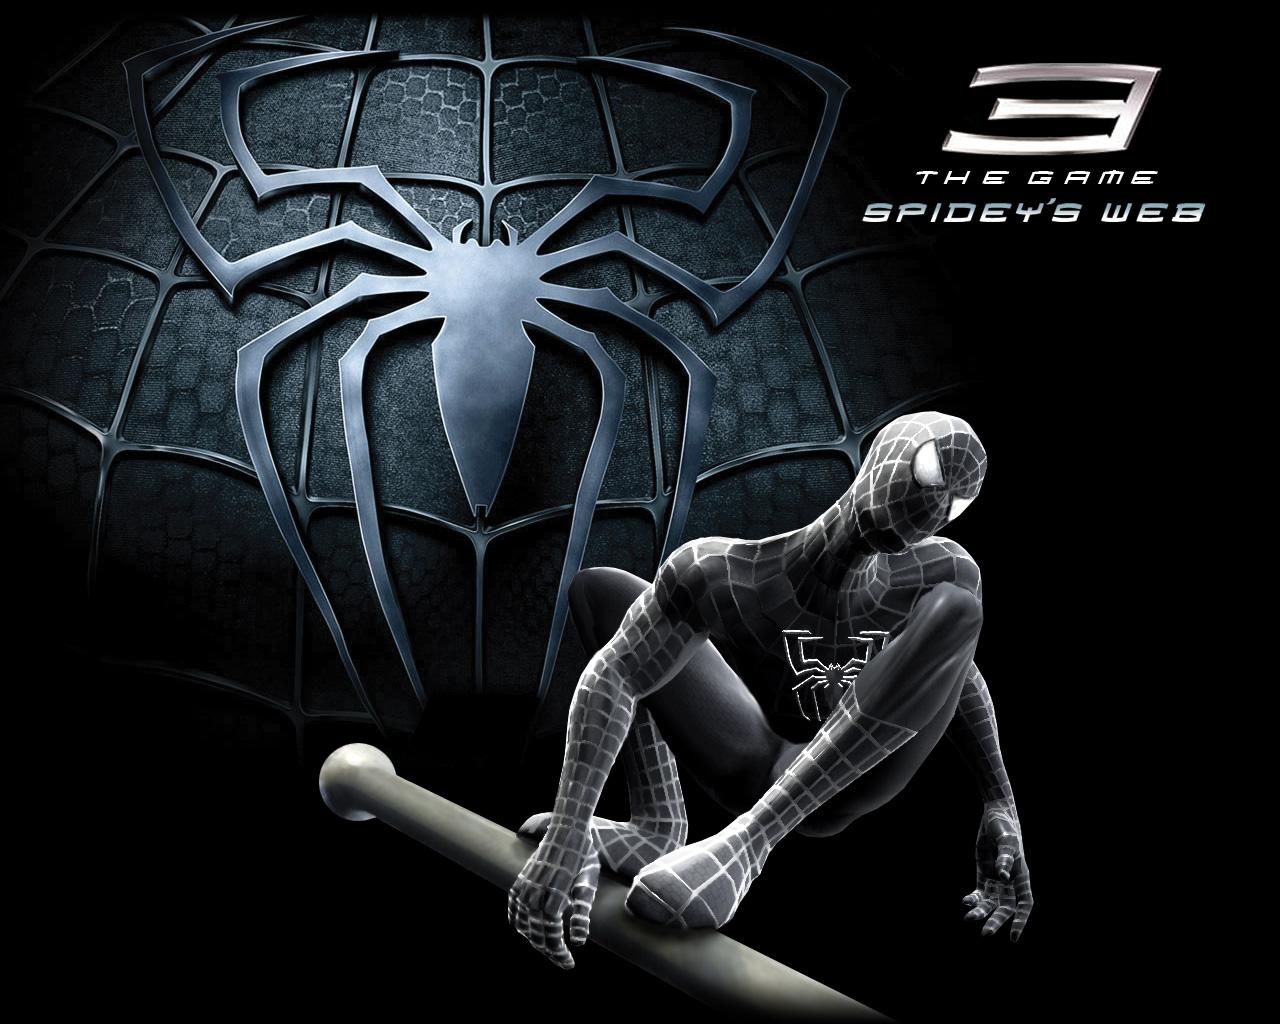 Spider man 3 wallpapers spider man wallpaper spider man 3 wallpaper 1280x1024